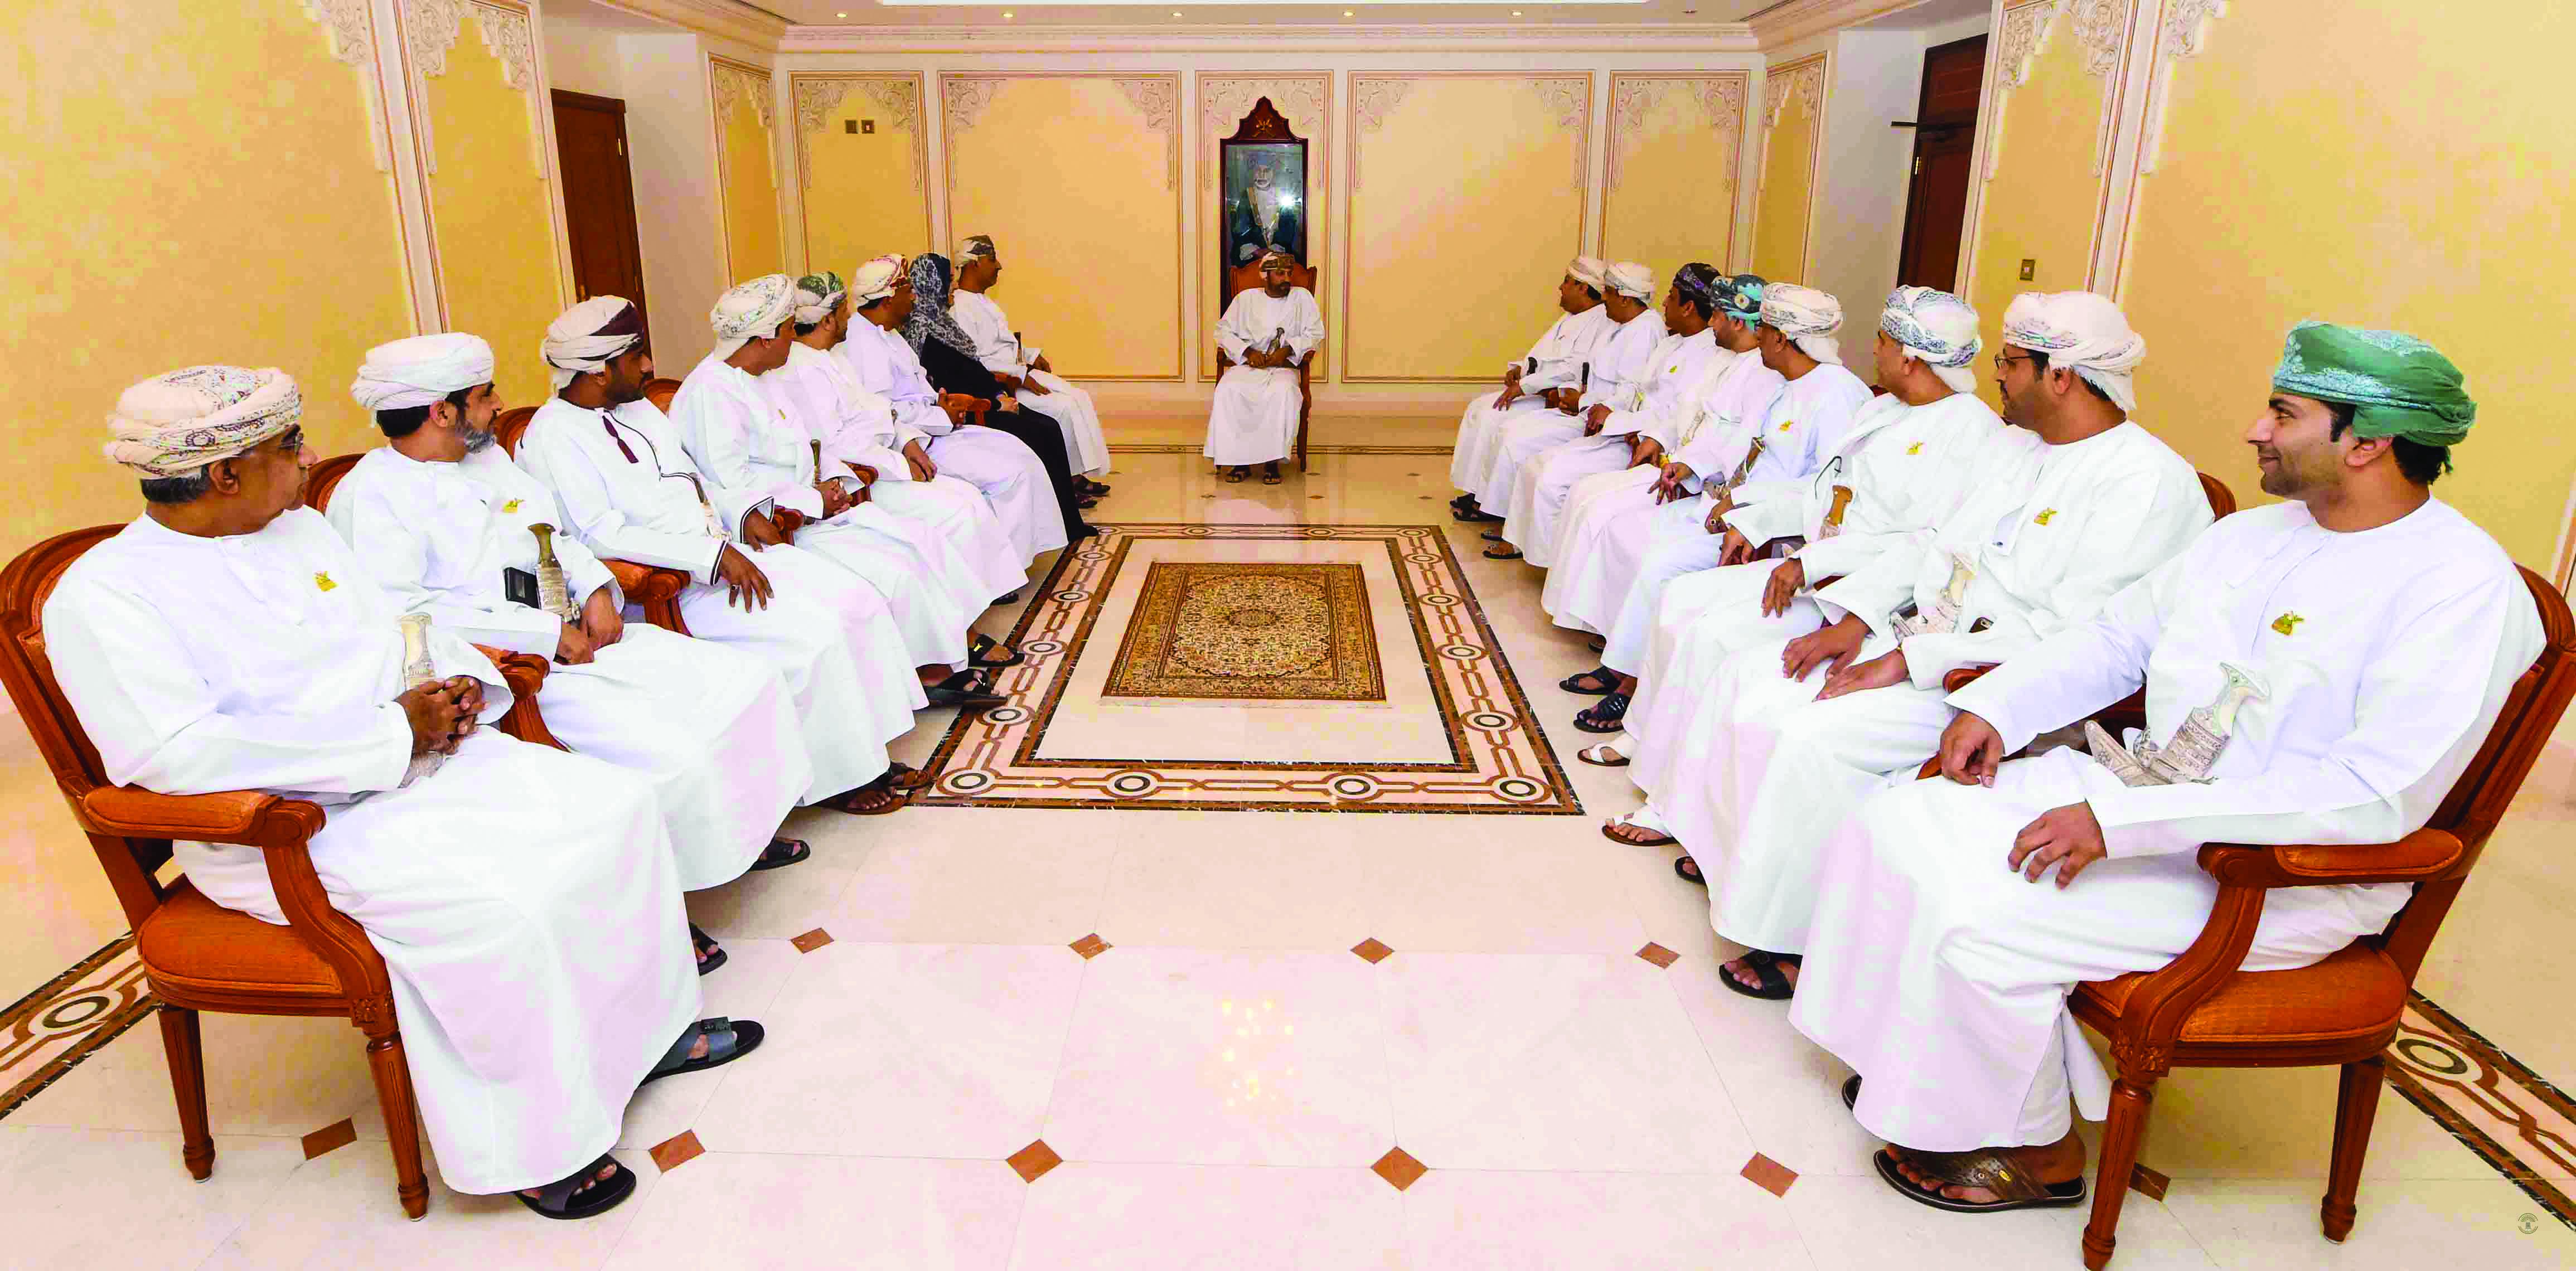 Oman's Minister of Interior praises media panel role